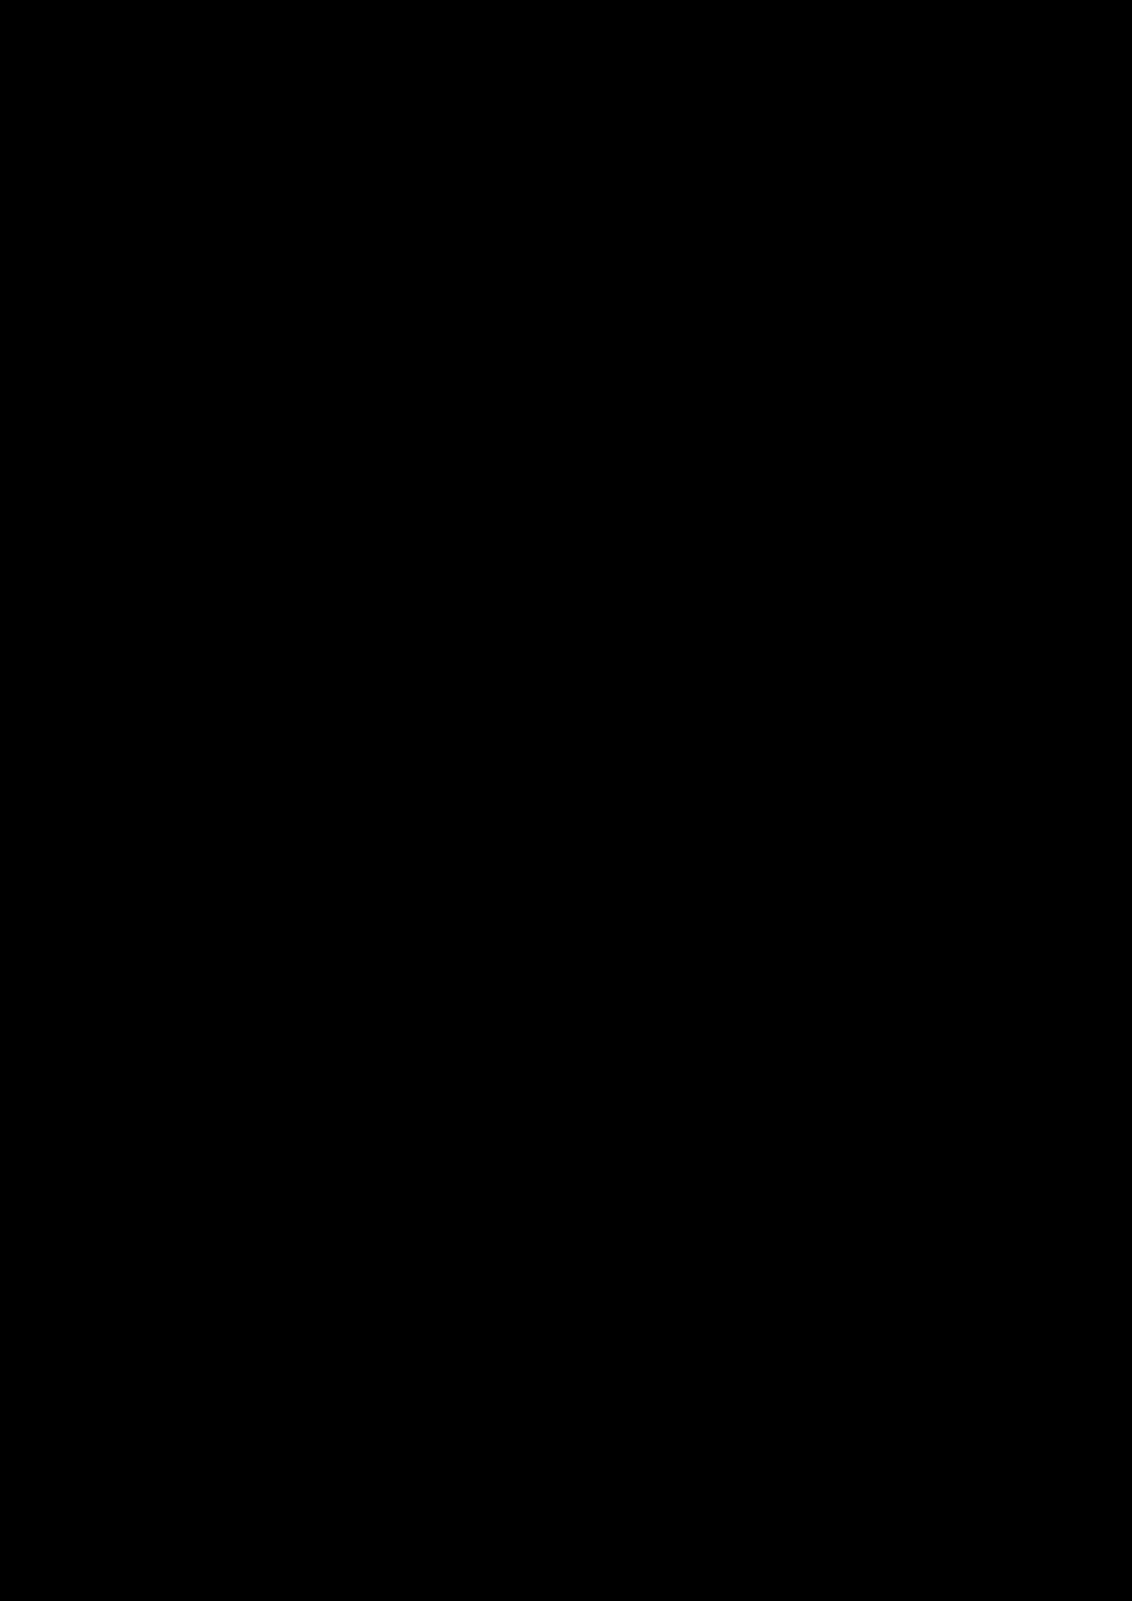 Belyiy sokol slide, Image 107